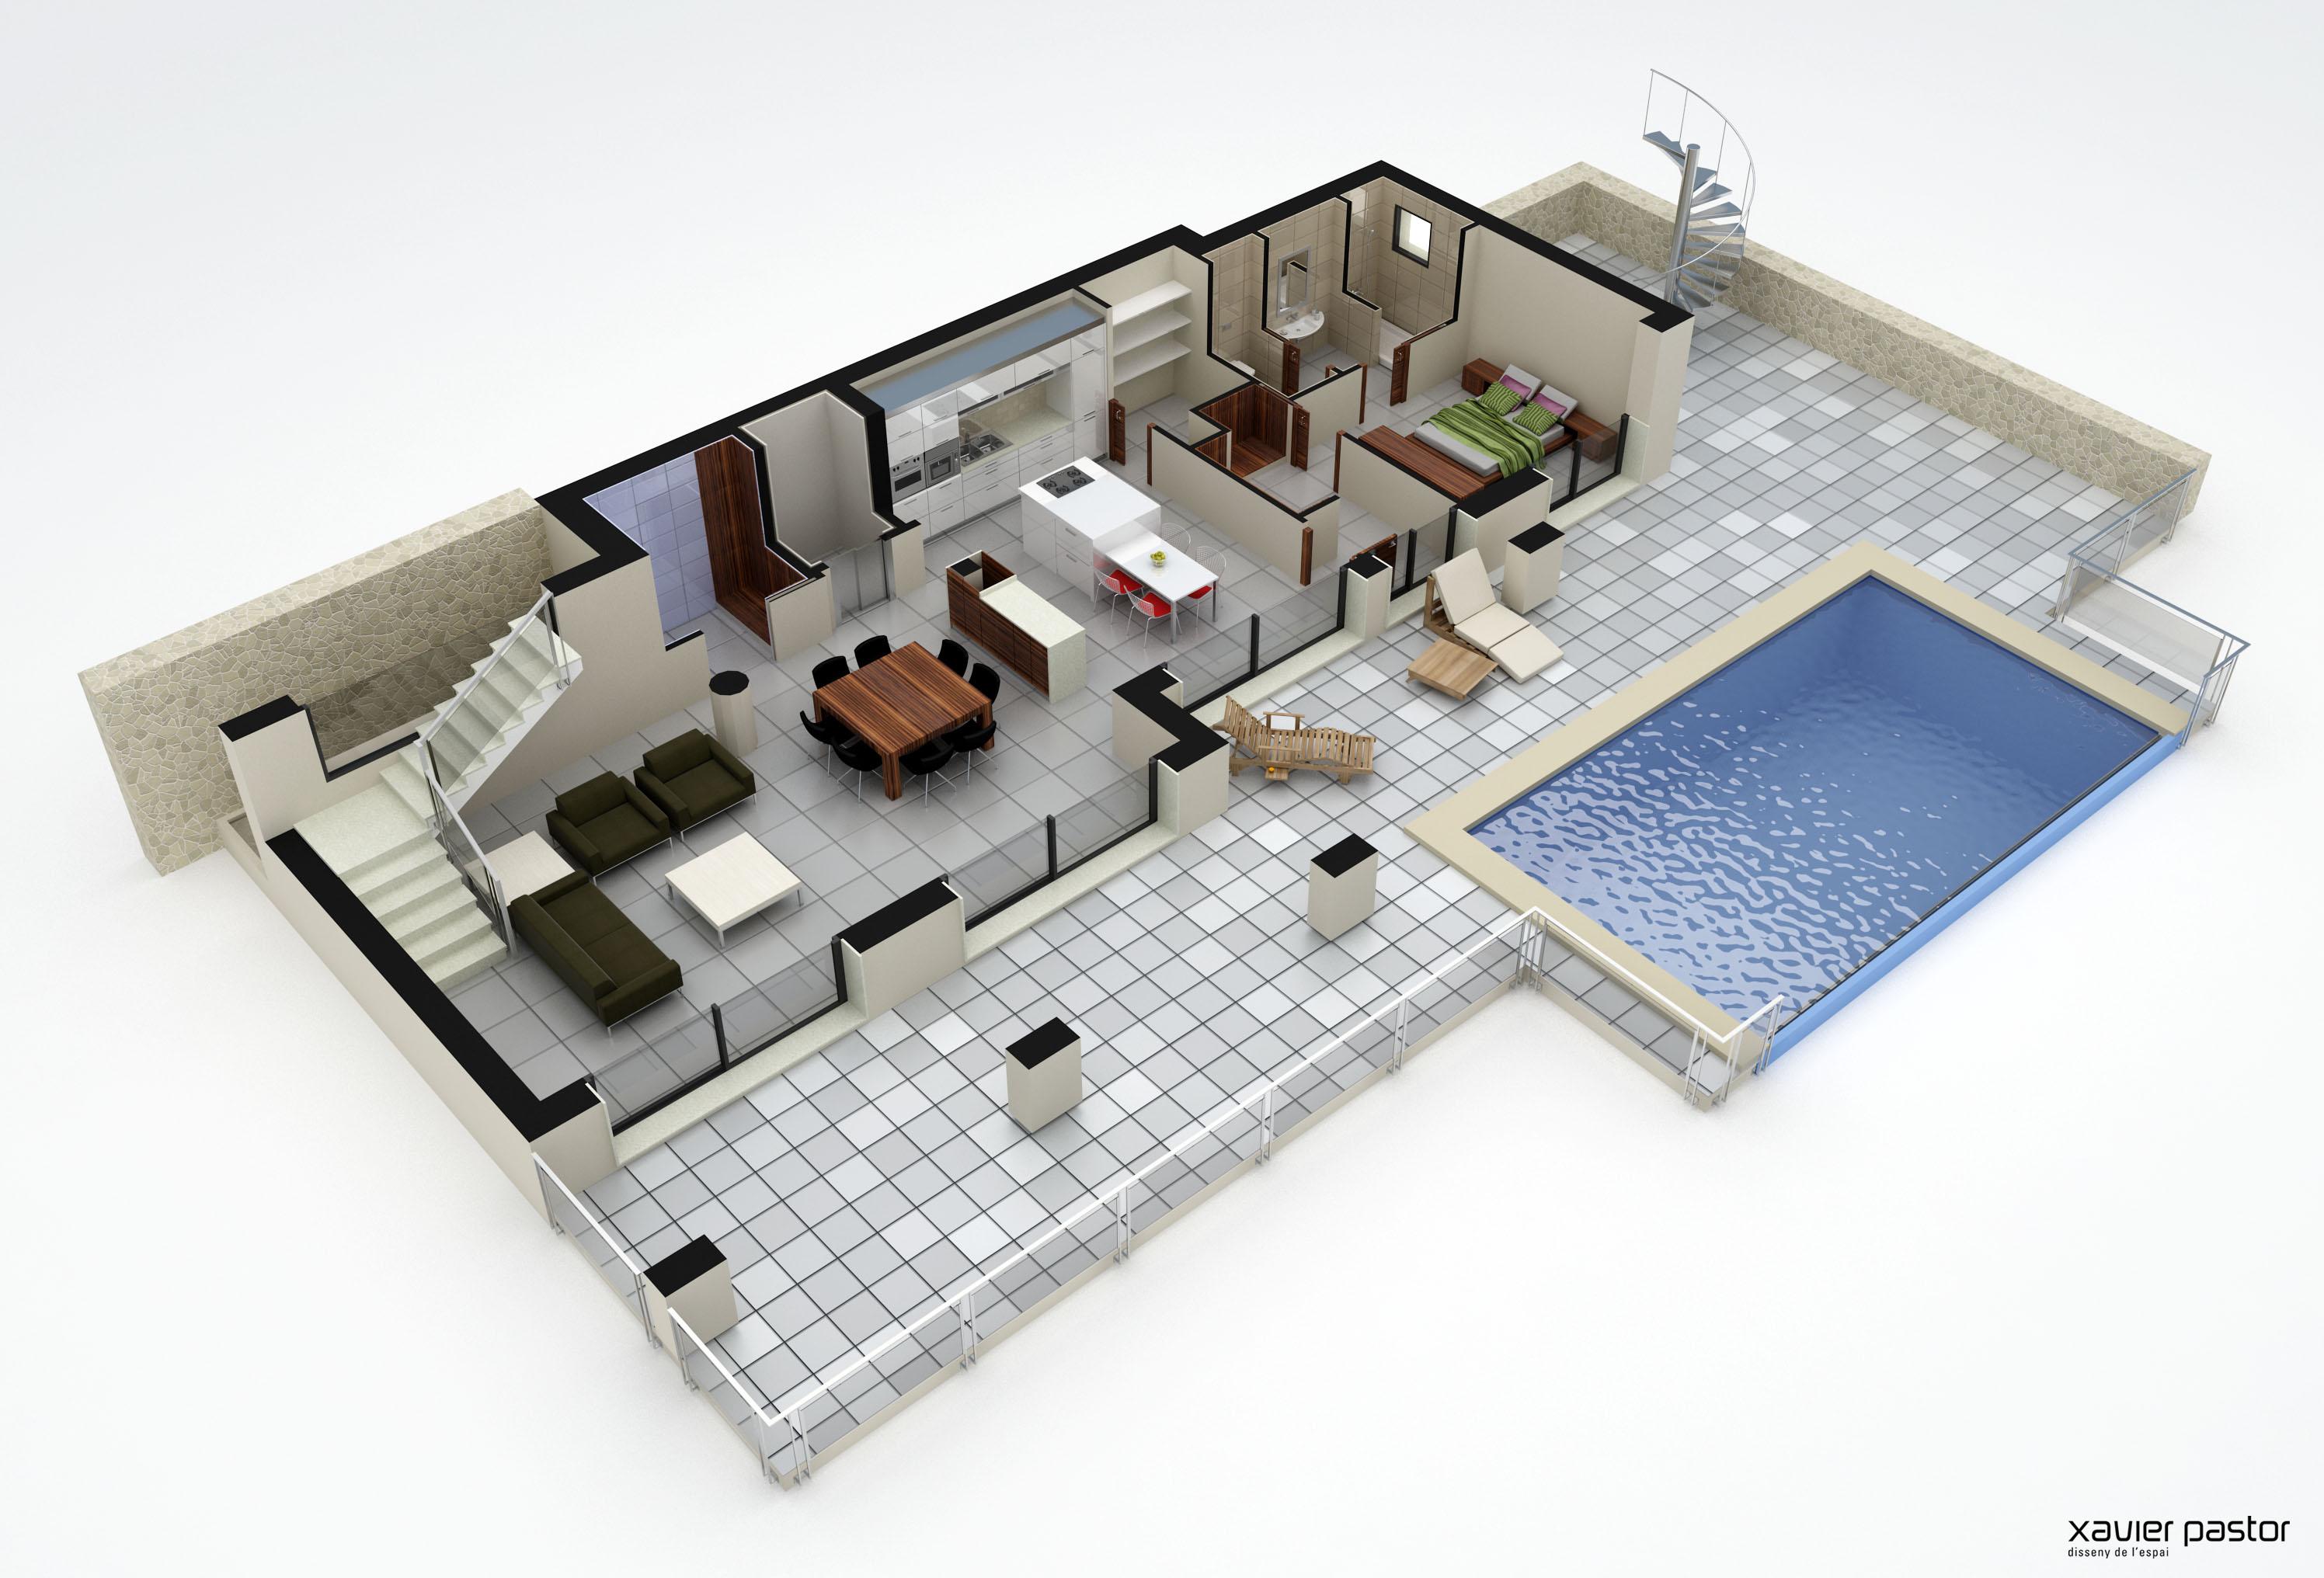 Douche In Slaapkamer Bouwen : Douche in slaapkamer bouwen luxe villa ...